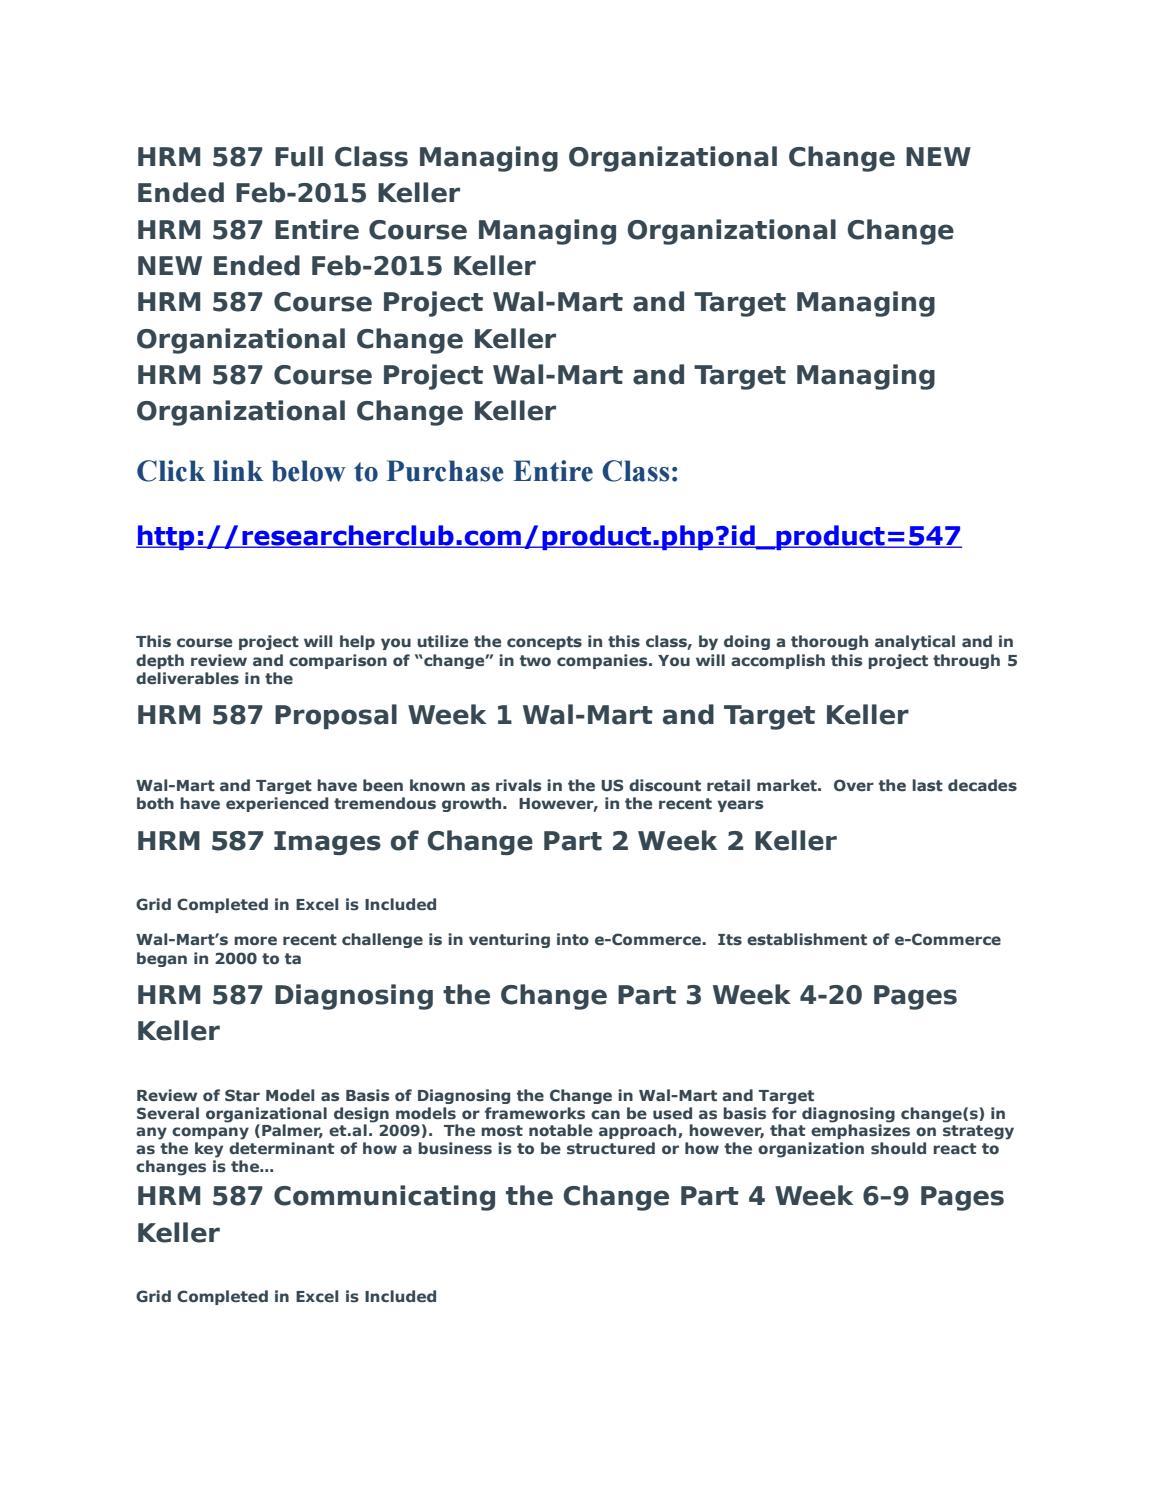 hrm587 classics supplemental articles list